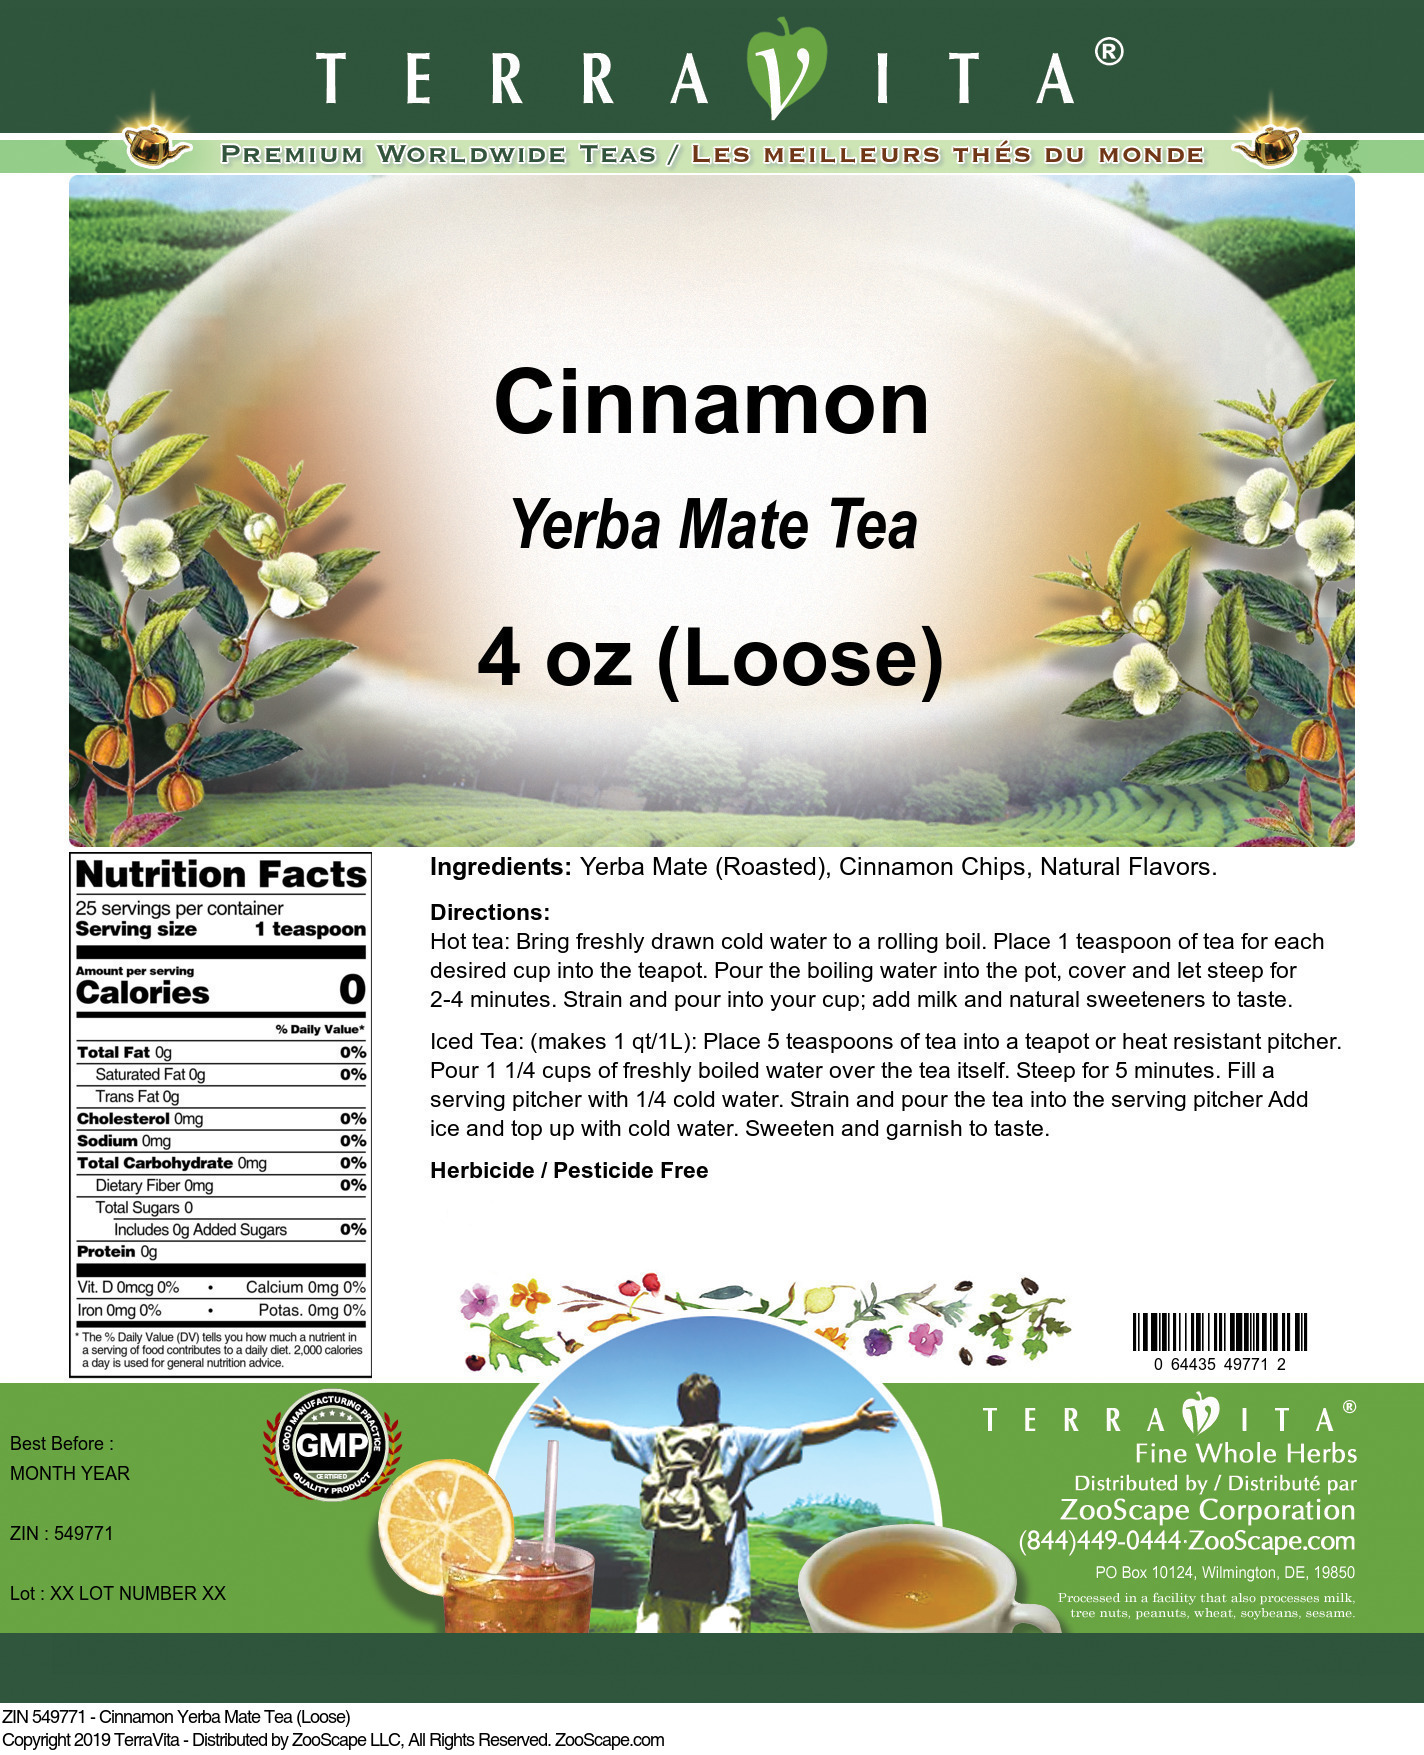 Cinnamon Yerba Mate